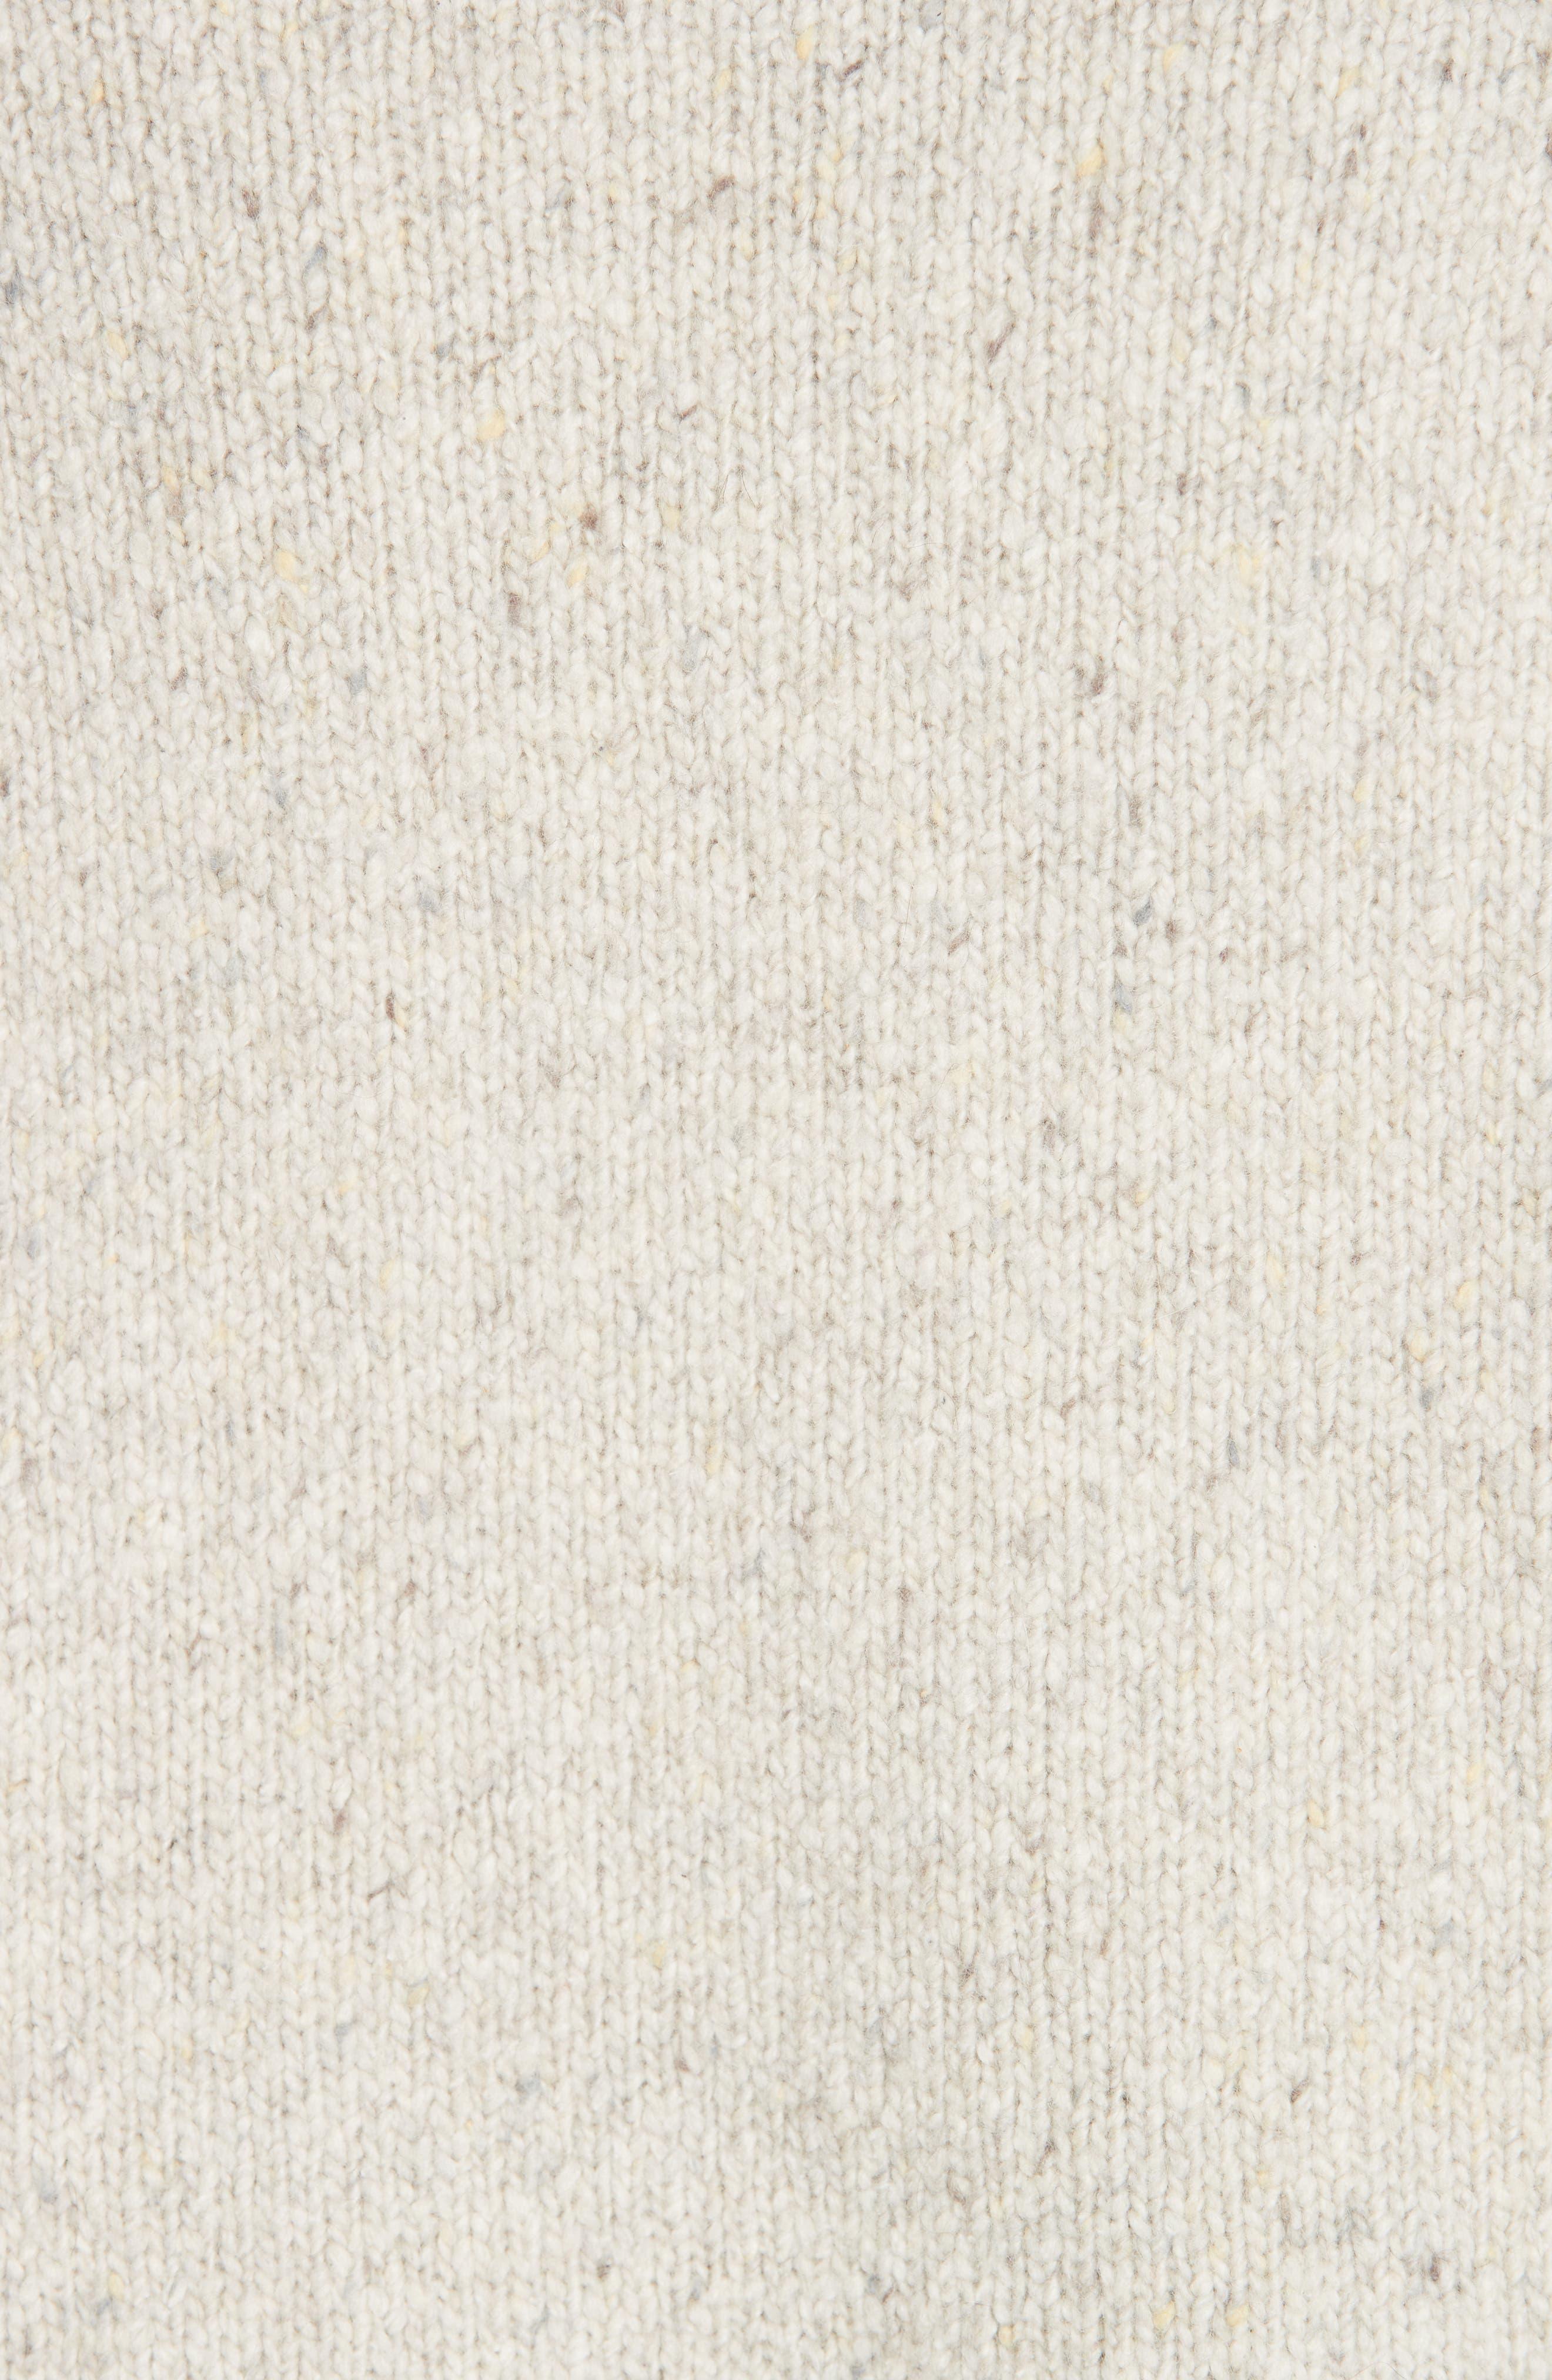 V-Neck Cashmere Sweater,                             Alternate thumbnail 5, color,                             902